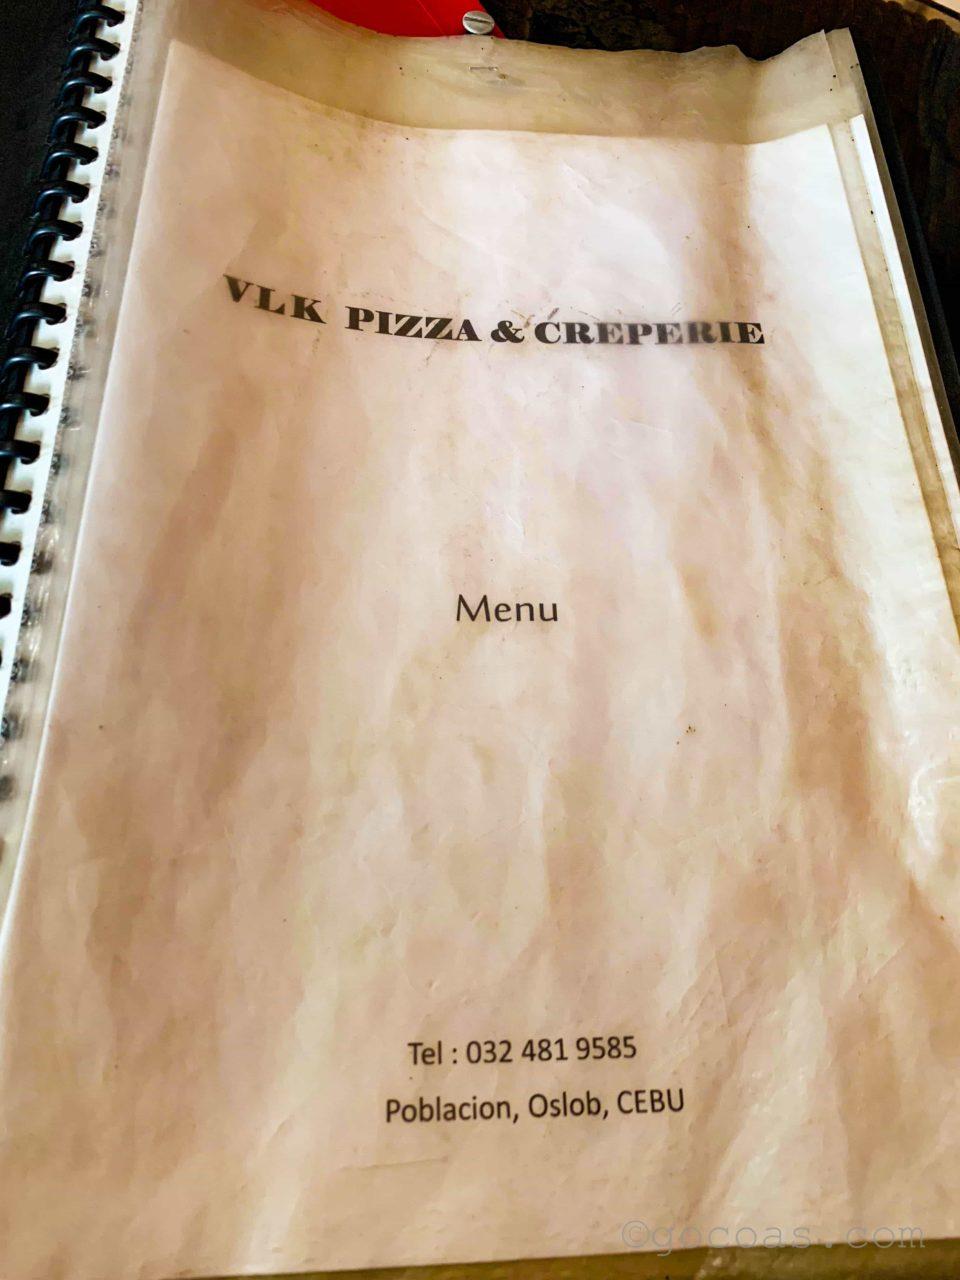 VLK PIZZA&CREPERIEレストランメニュー